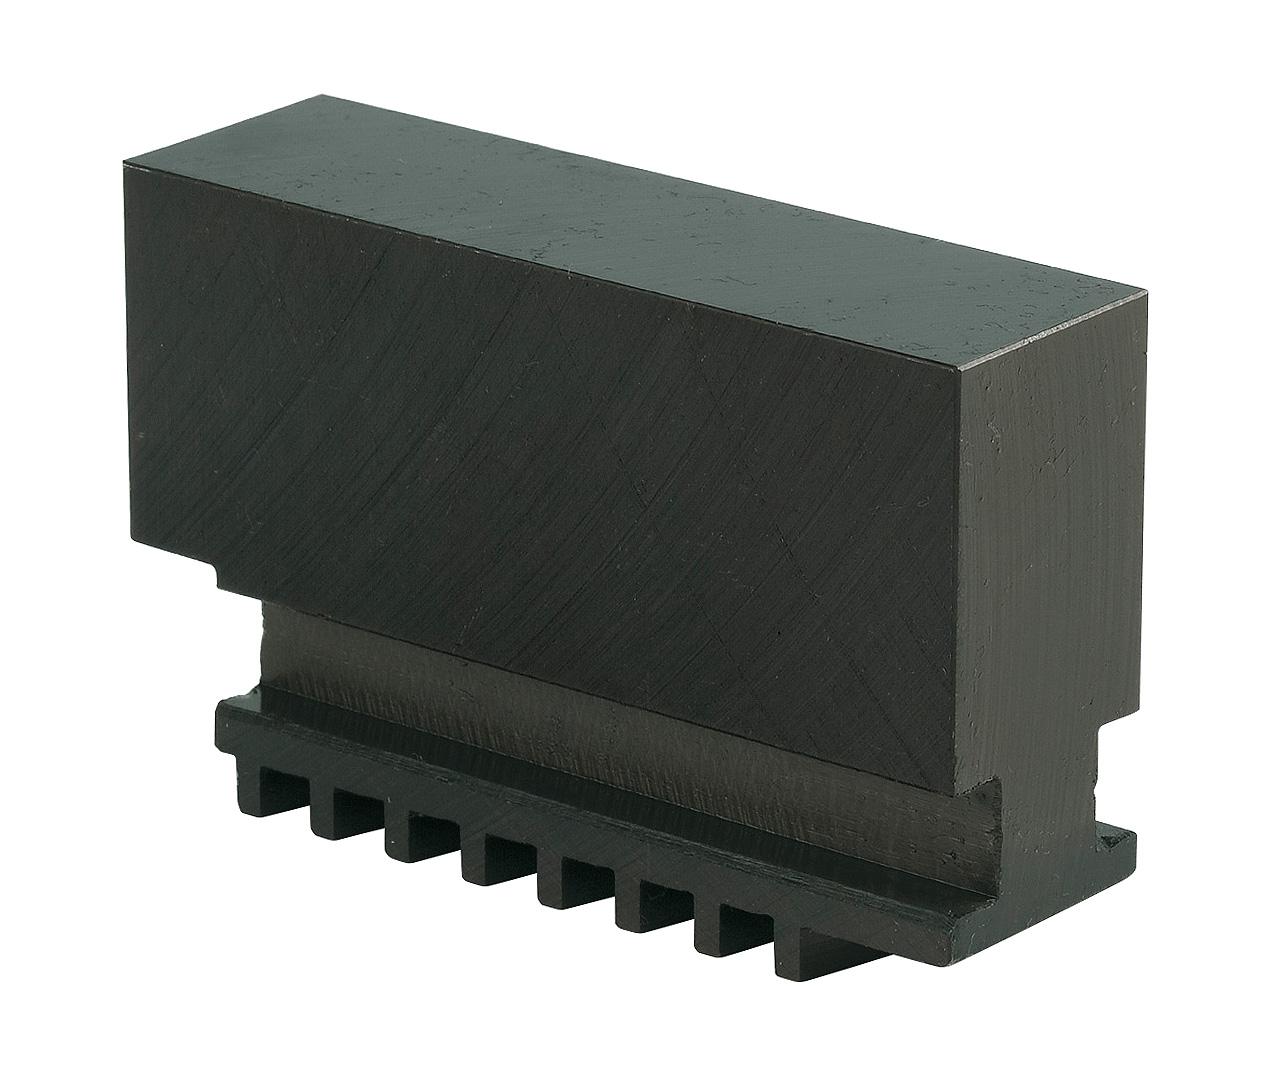 Szczęki jednolite miękkie - komplet DSJ-DK11-400 BERNARDO